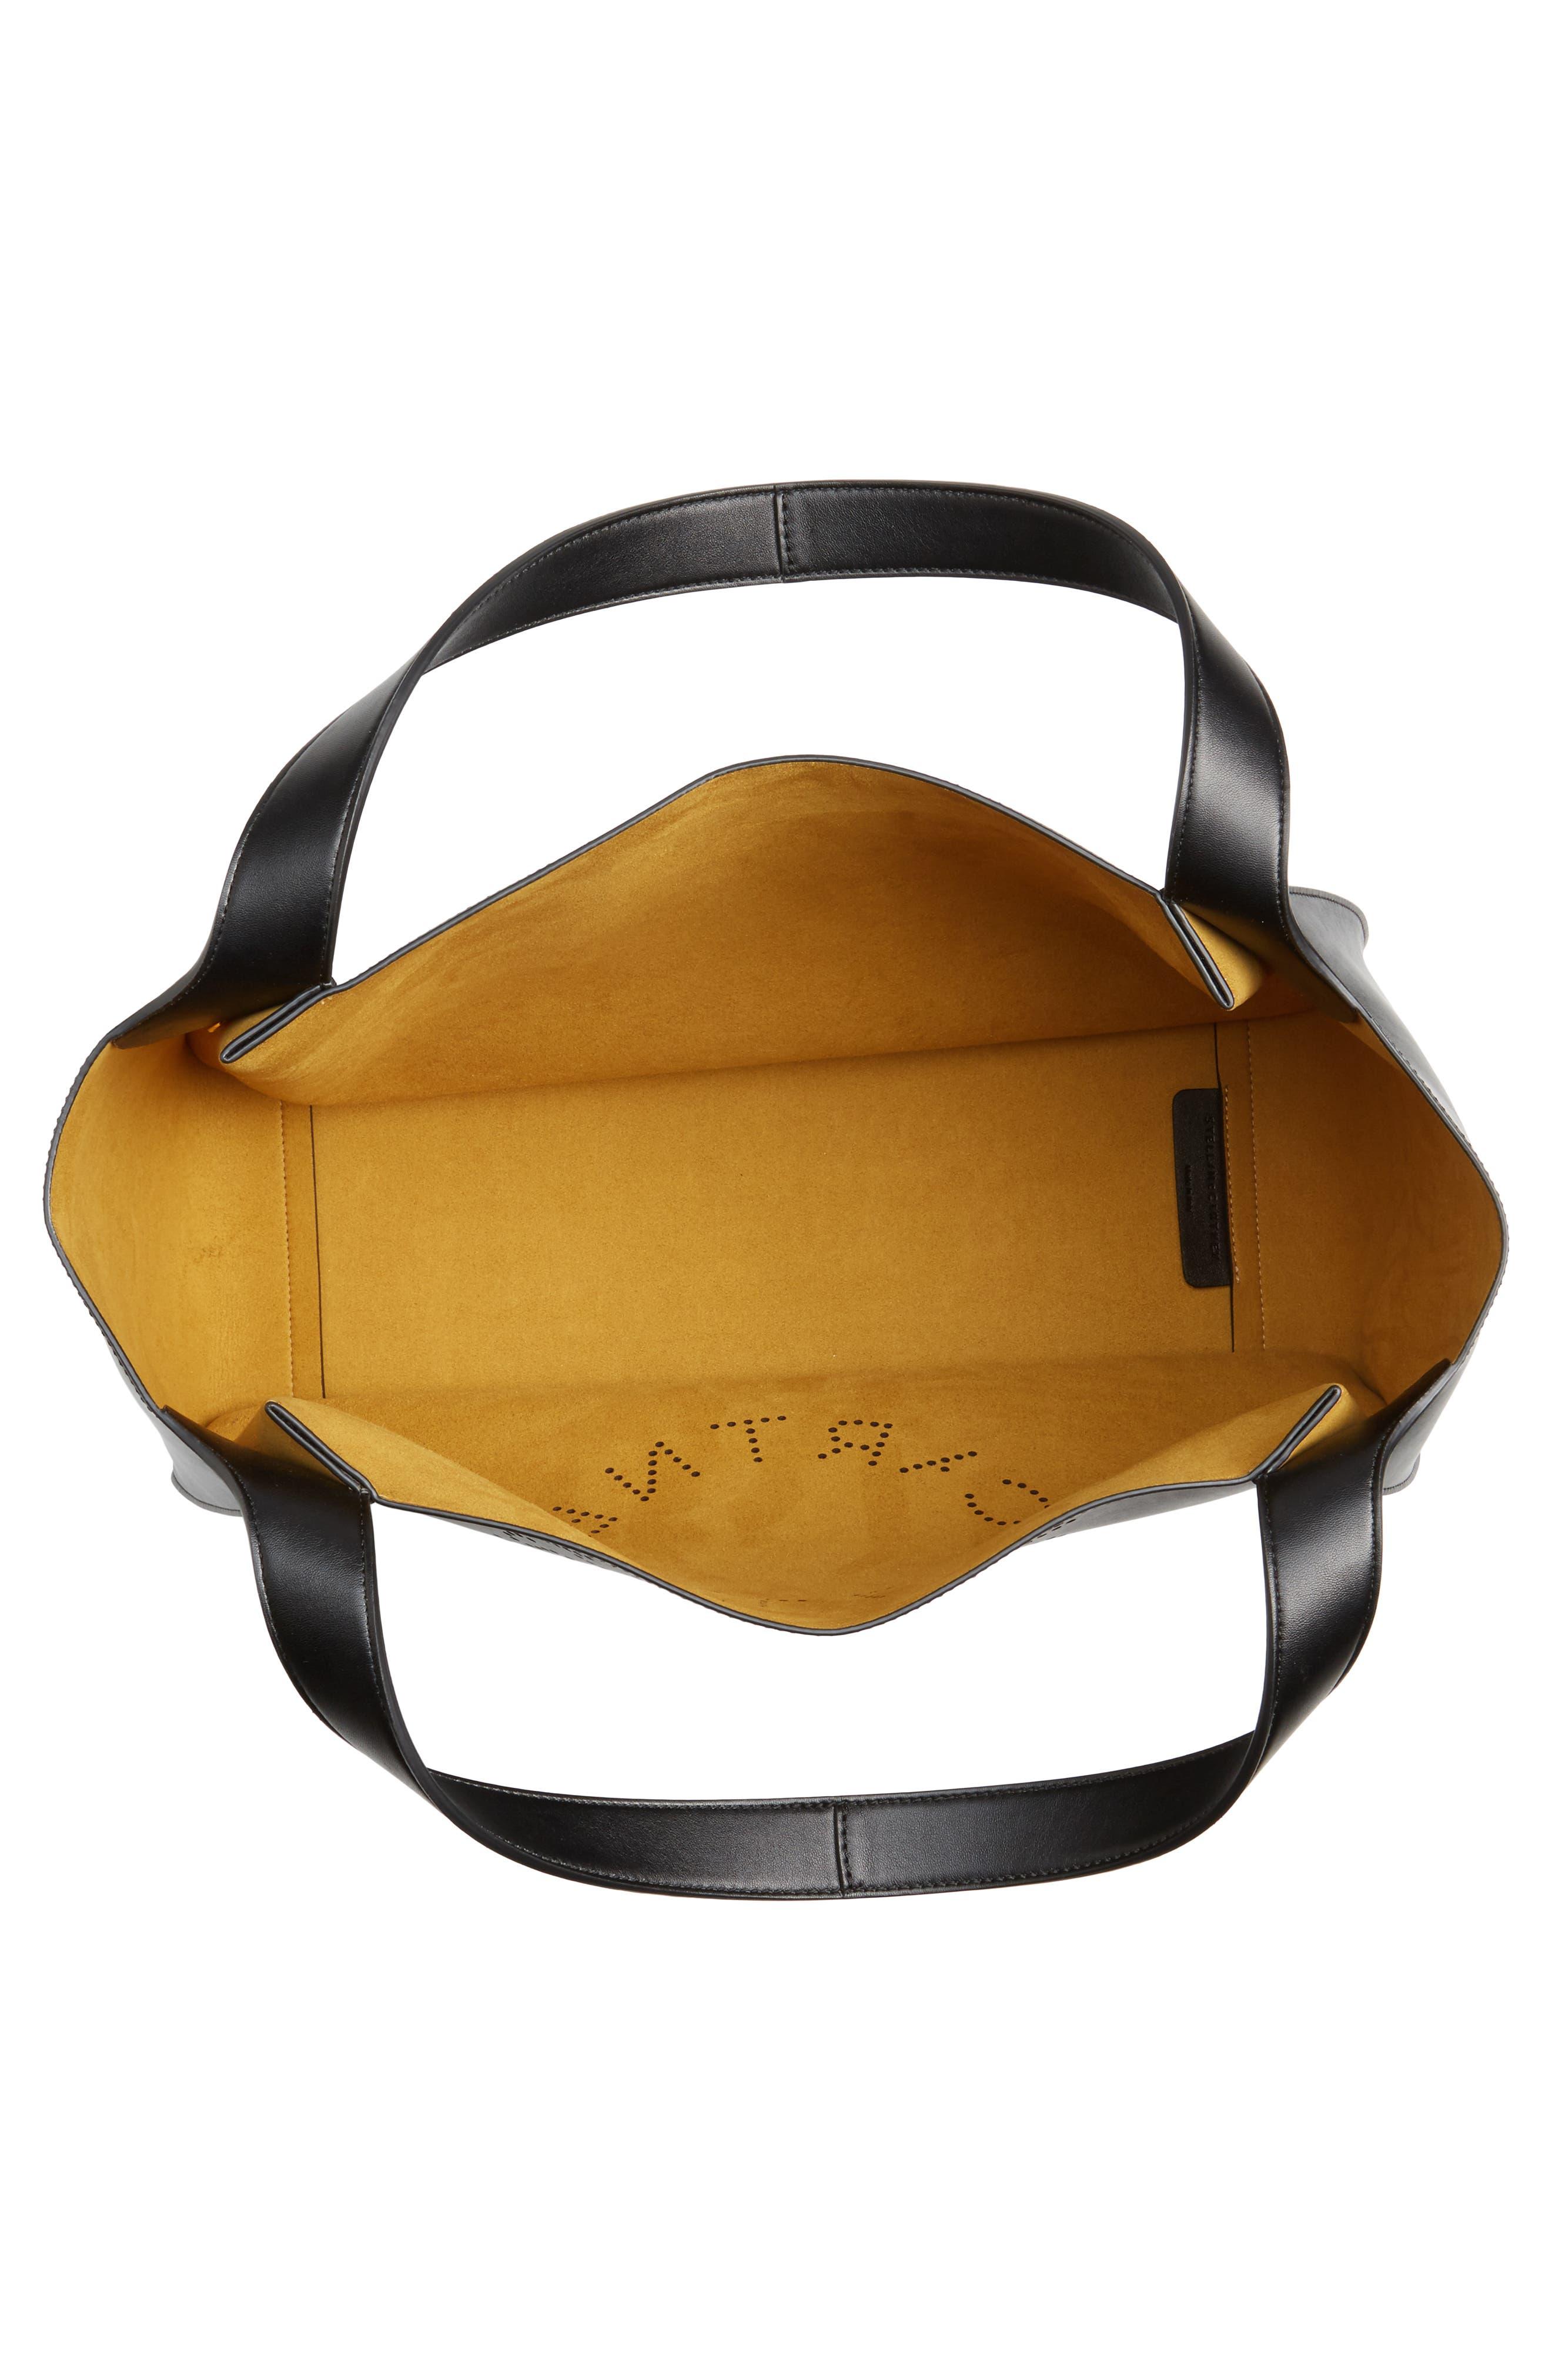 STELLA MCCARTNEY, Medium Perforated Logo Faux Leather Tote, Alternate thumbnail 4, color, BLACK